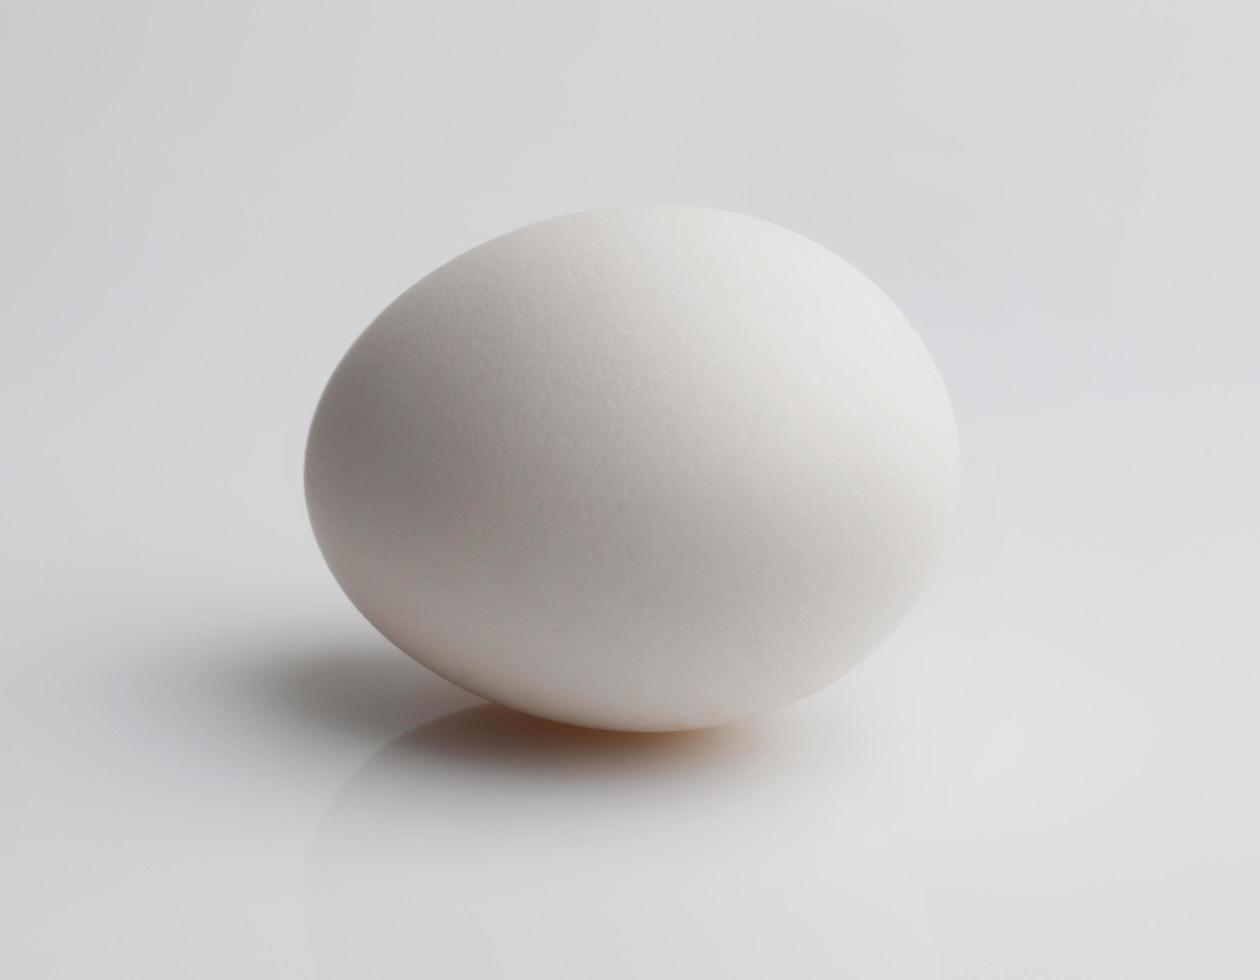 huevo crudo sobre un fondo claro foto